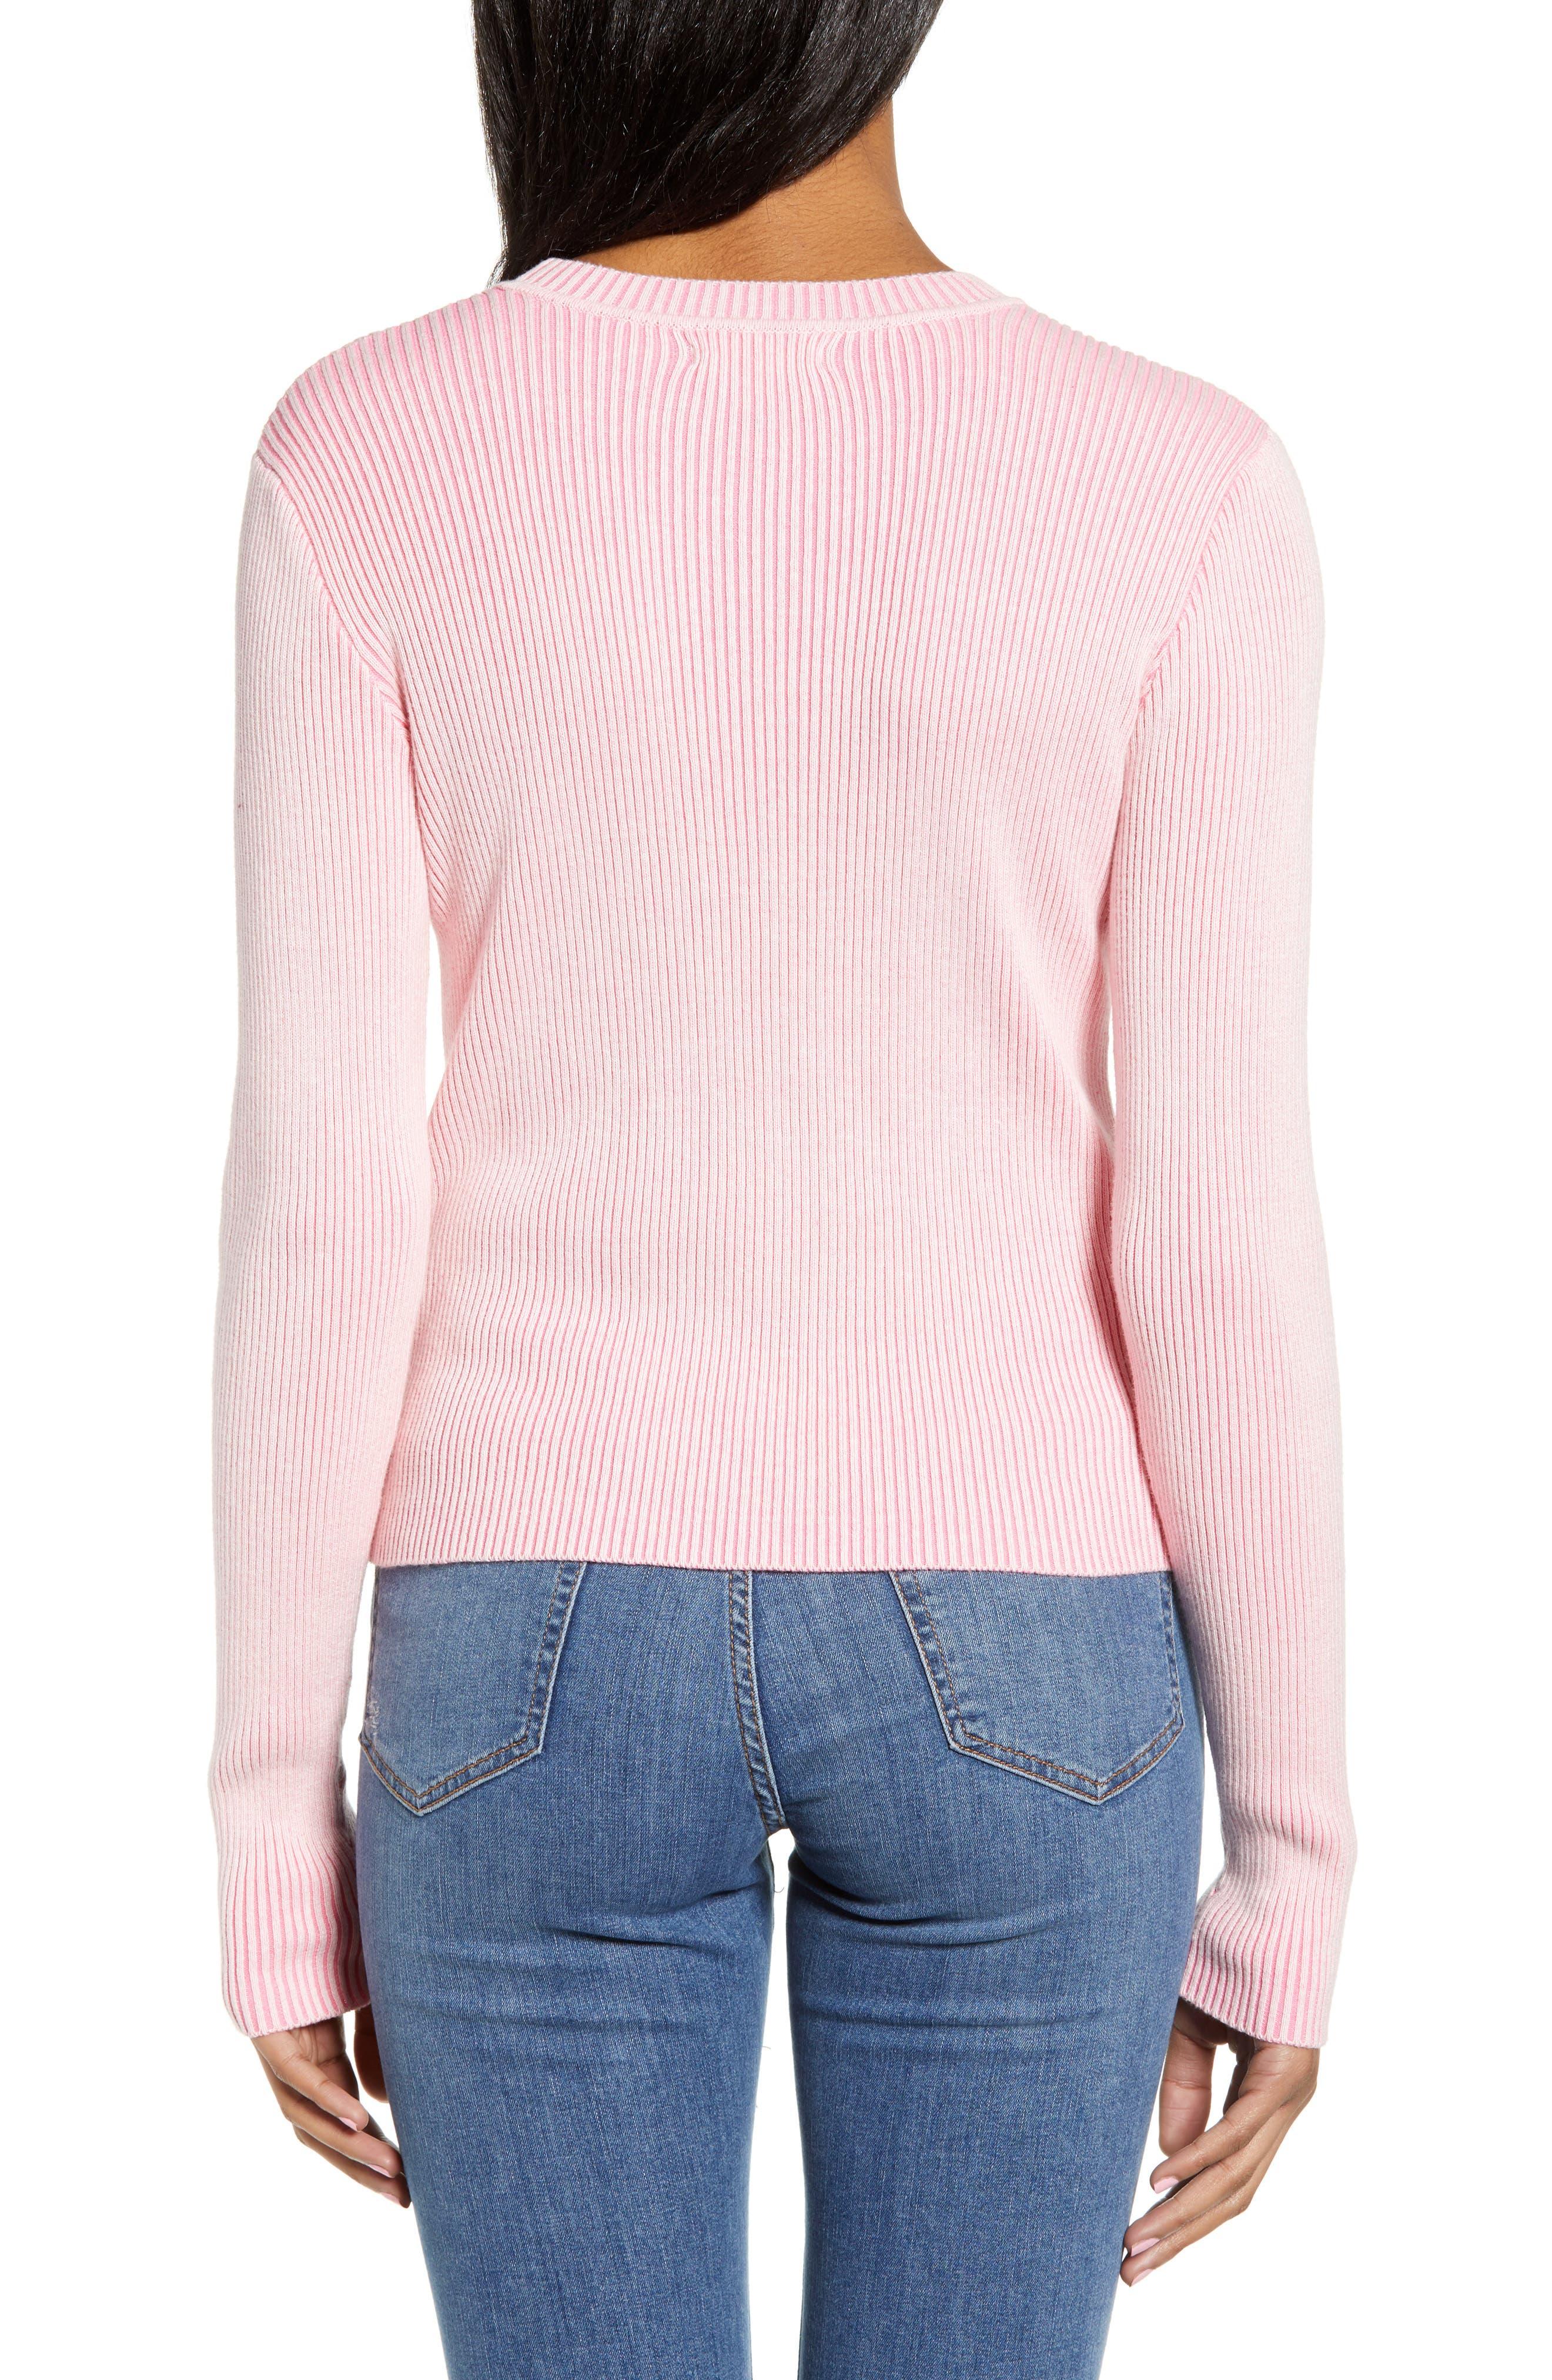 e43d0ab74 bp sweaters